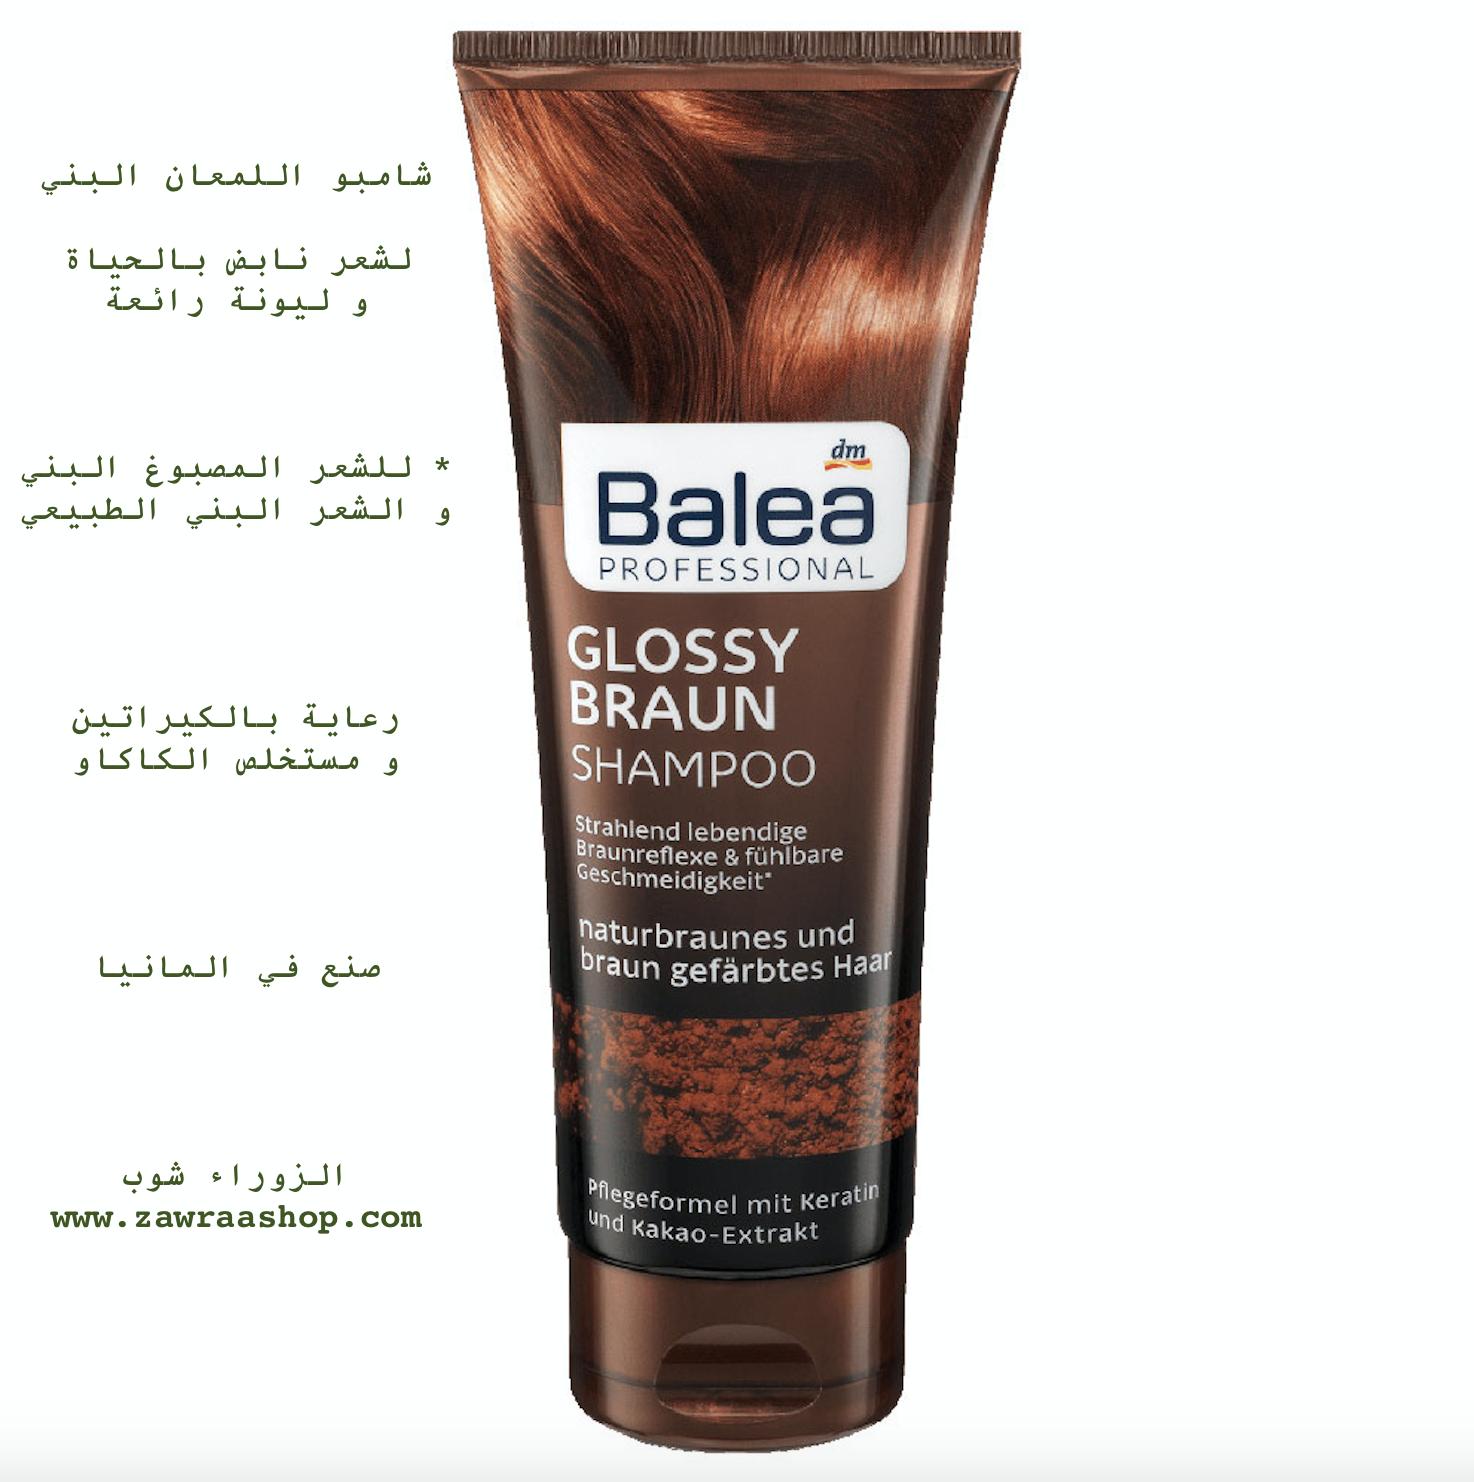 B408 glossy braun shampoo شامبو عصارة ٢٥٠ نل للشعر البني الحريري 00448